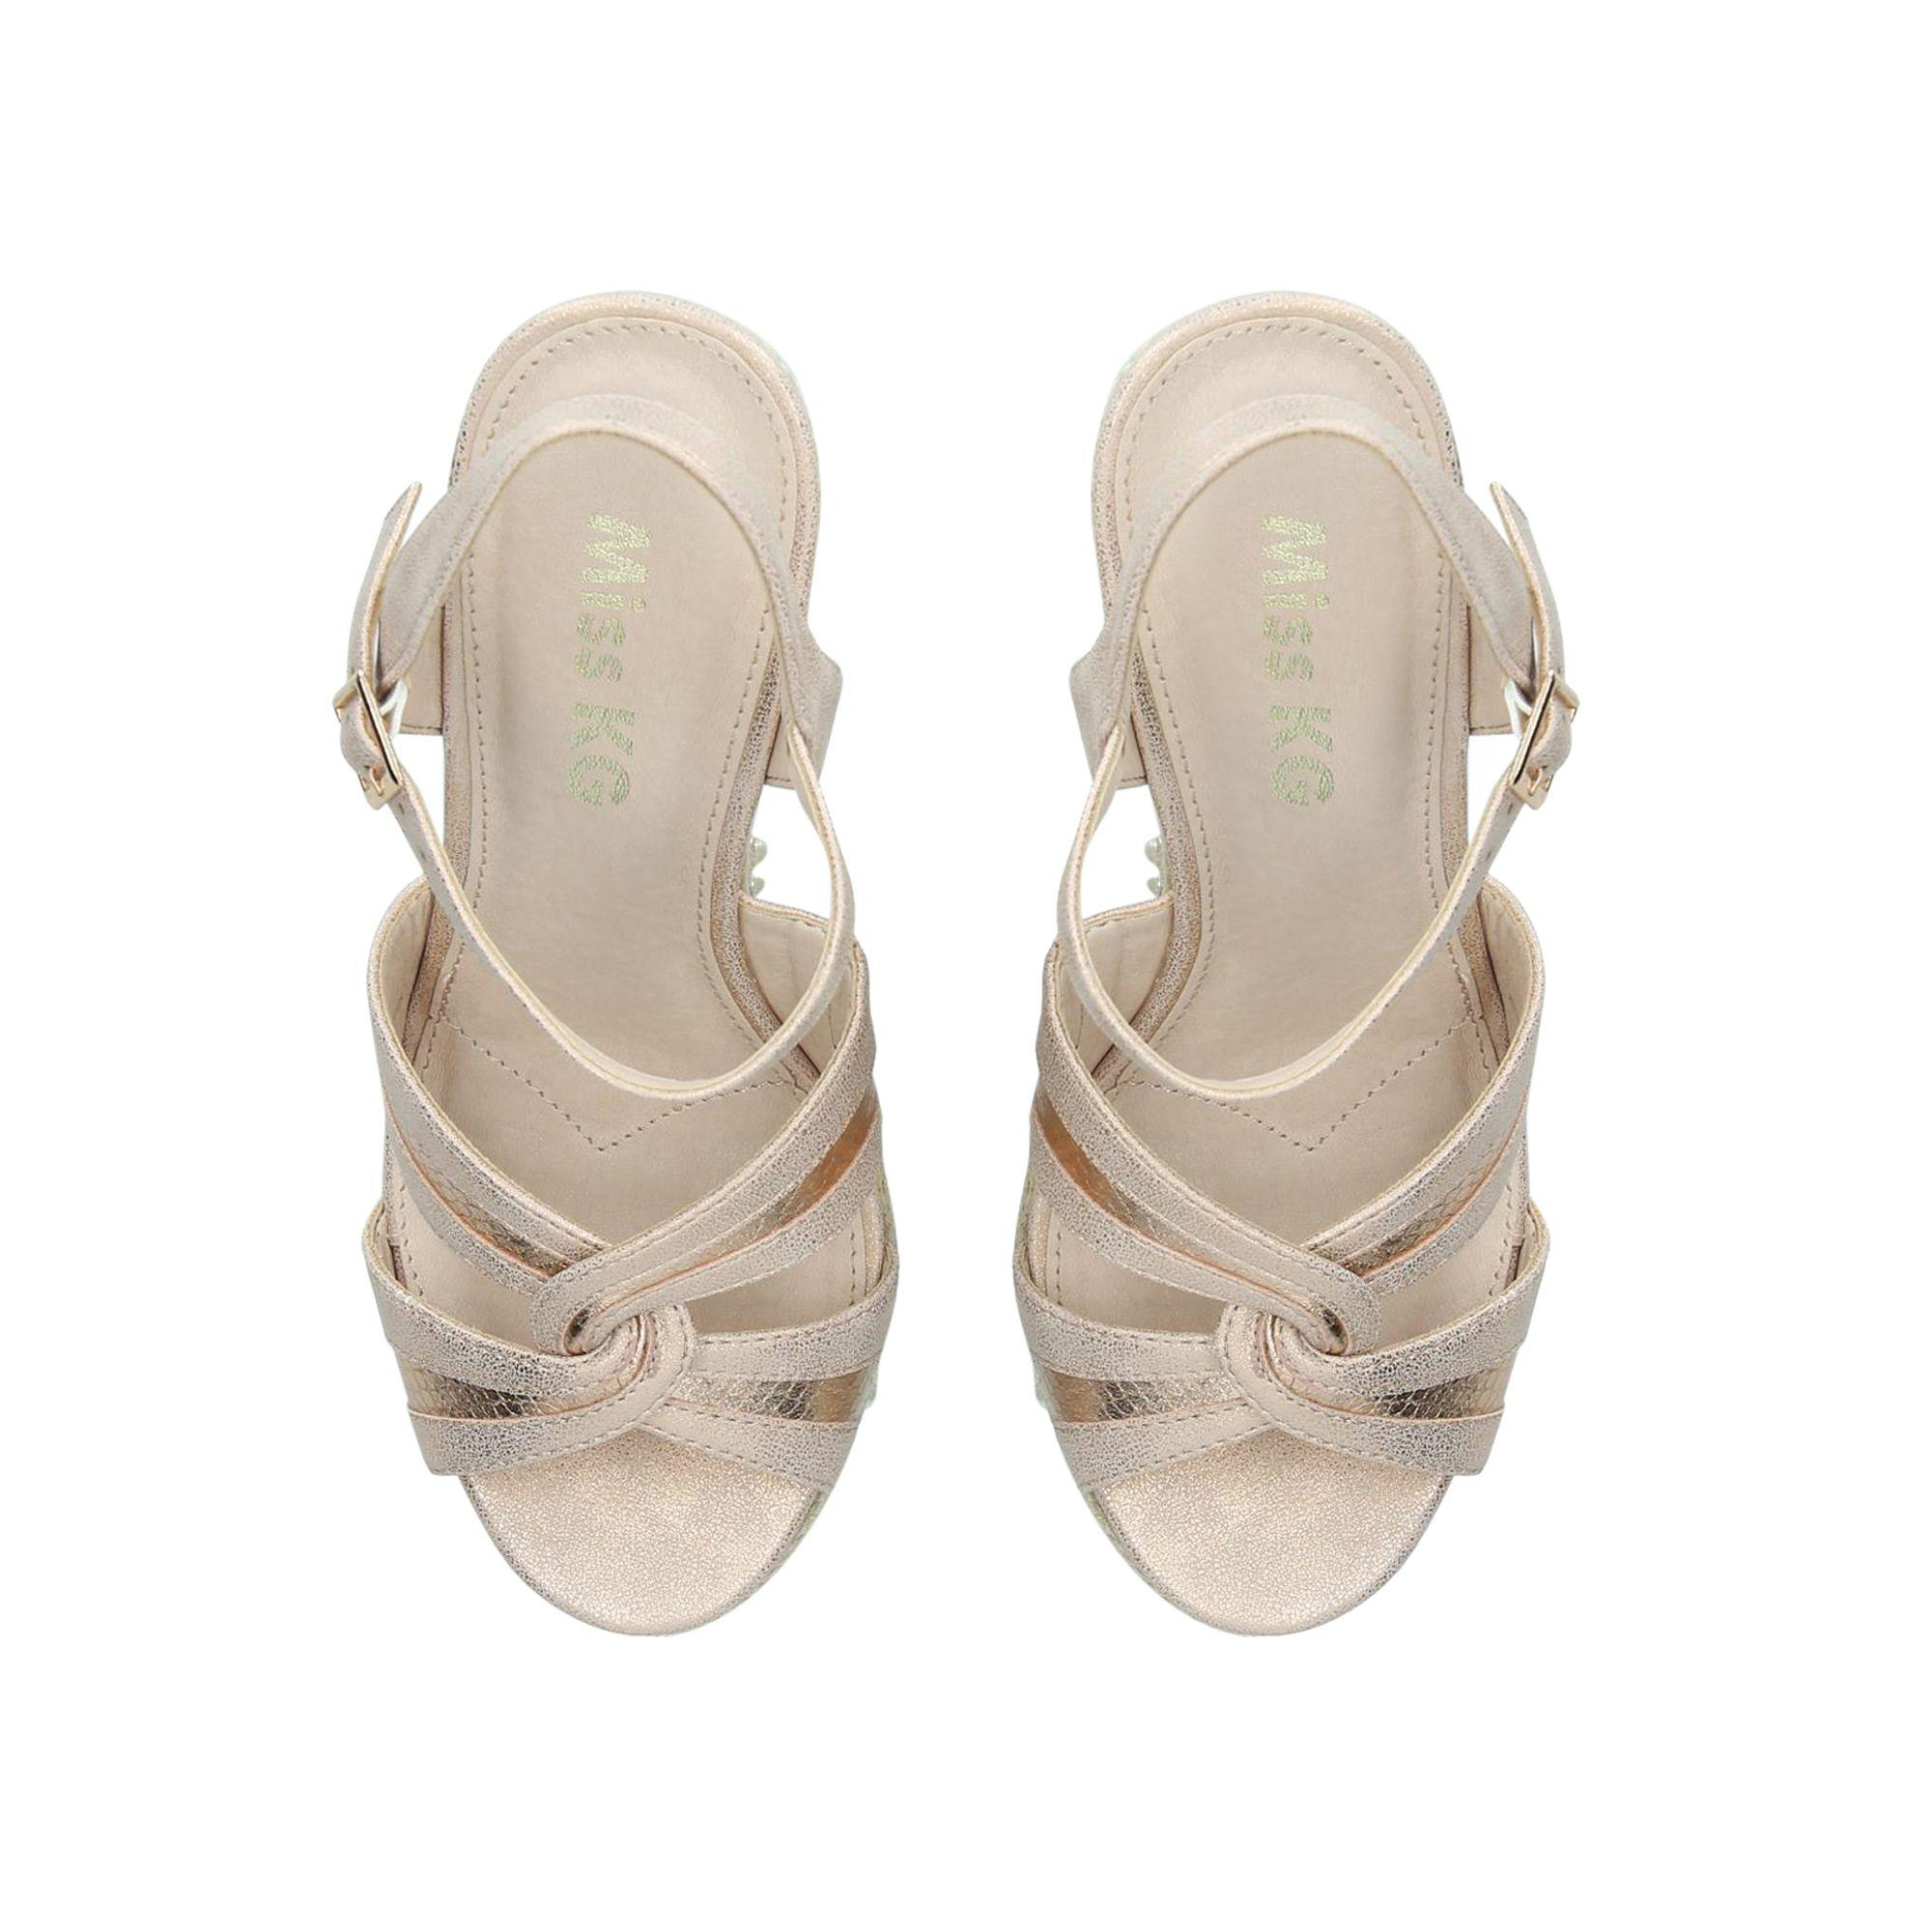 ea82358c1b Miss Kg - Natural Cream 'dani' Mid Heel Wedge Sandals - Lyst. View  fullscreen